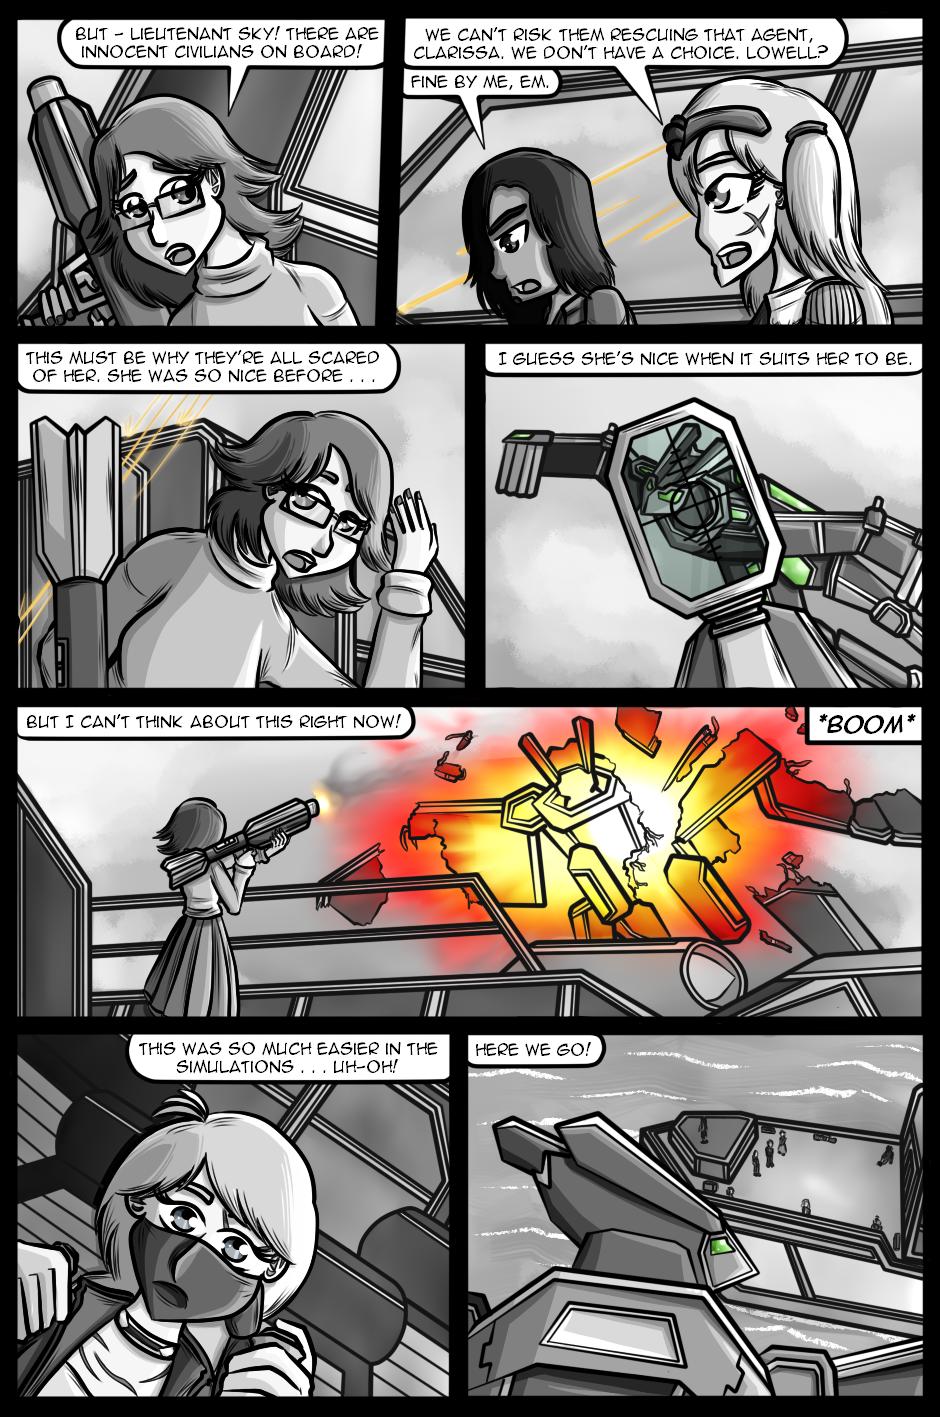 Fire Suppression, Part 30